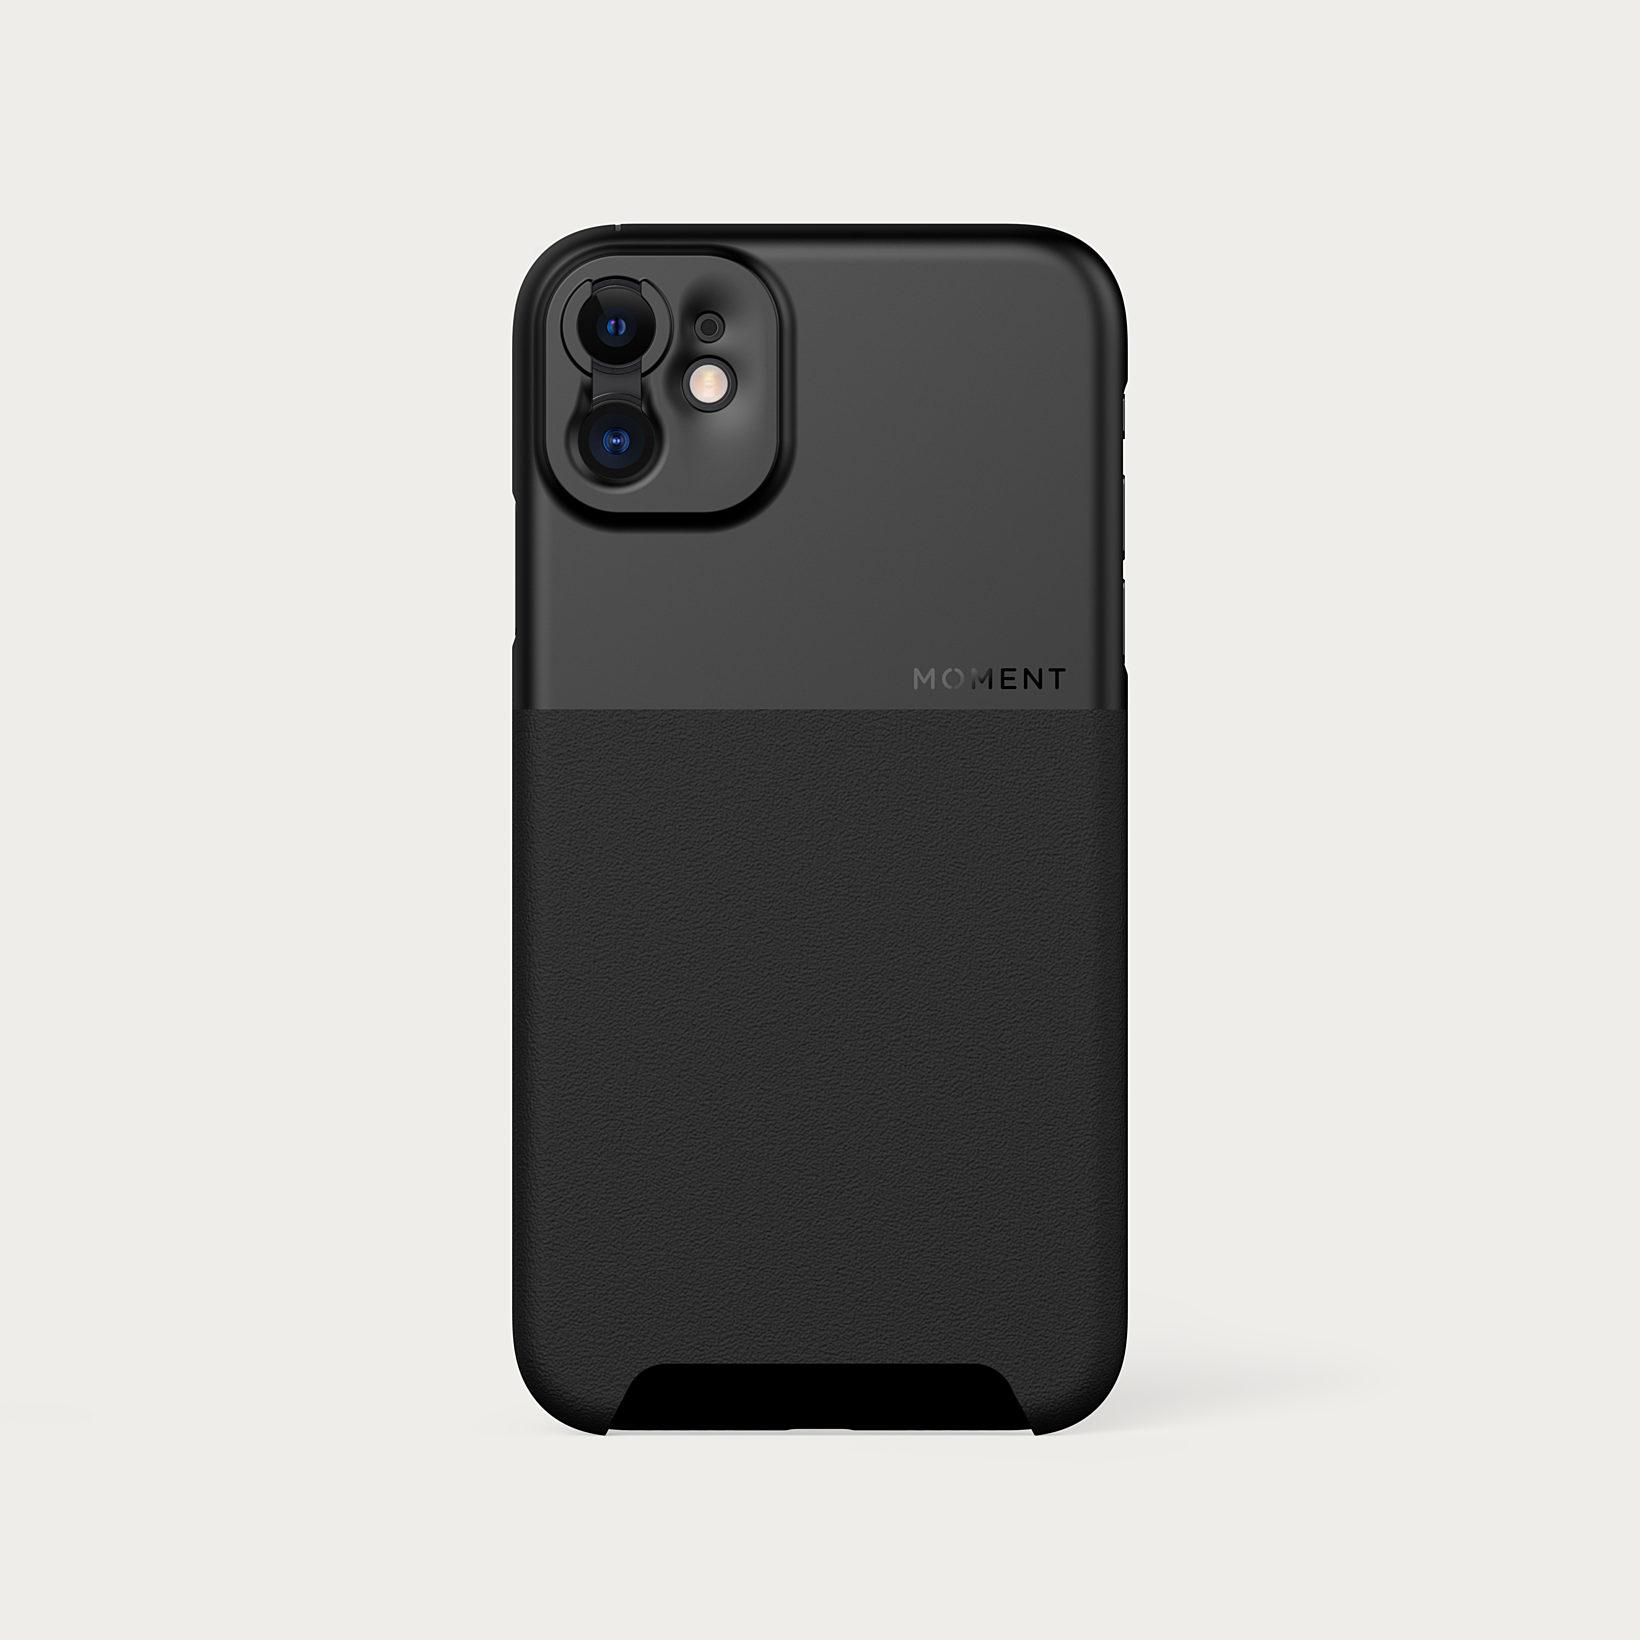 iPhone Filmmaker Case